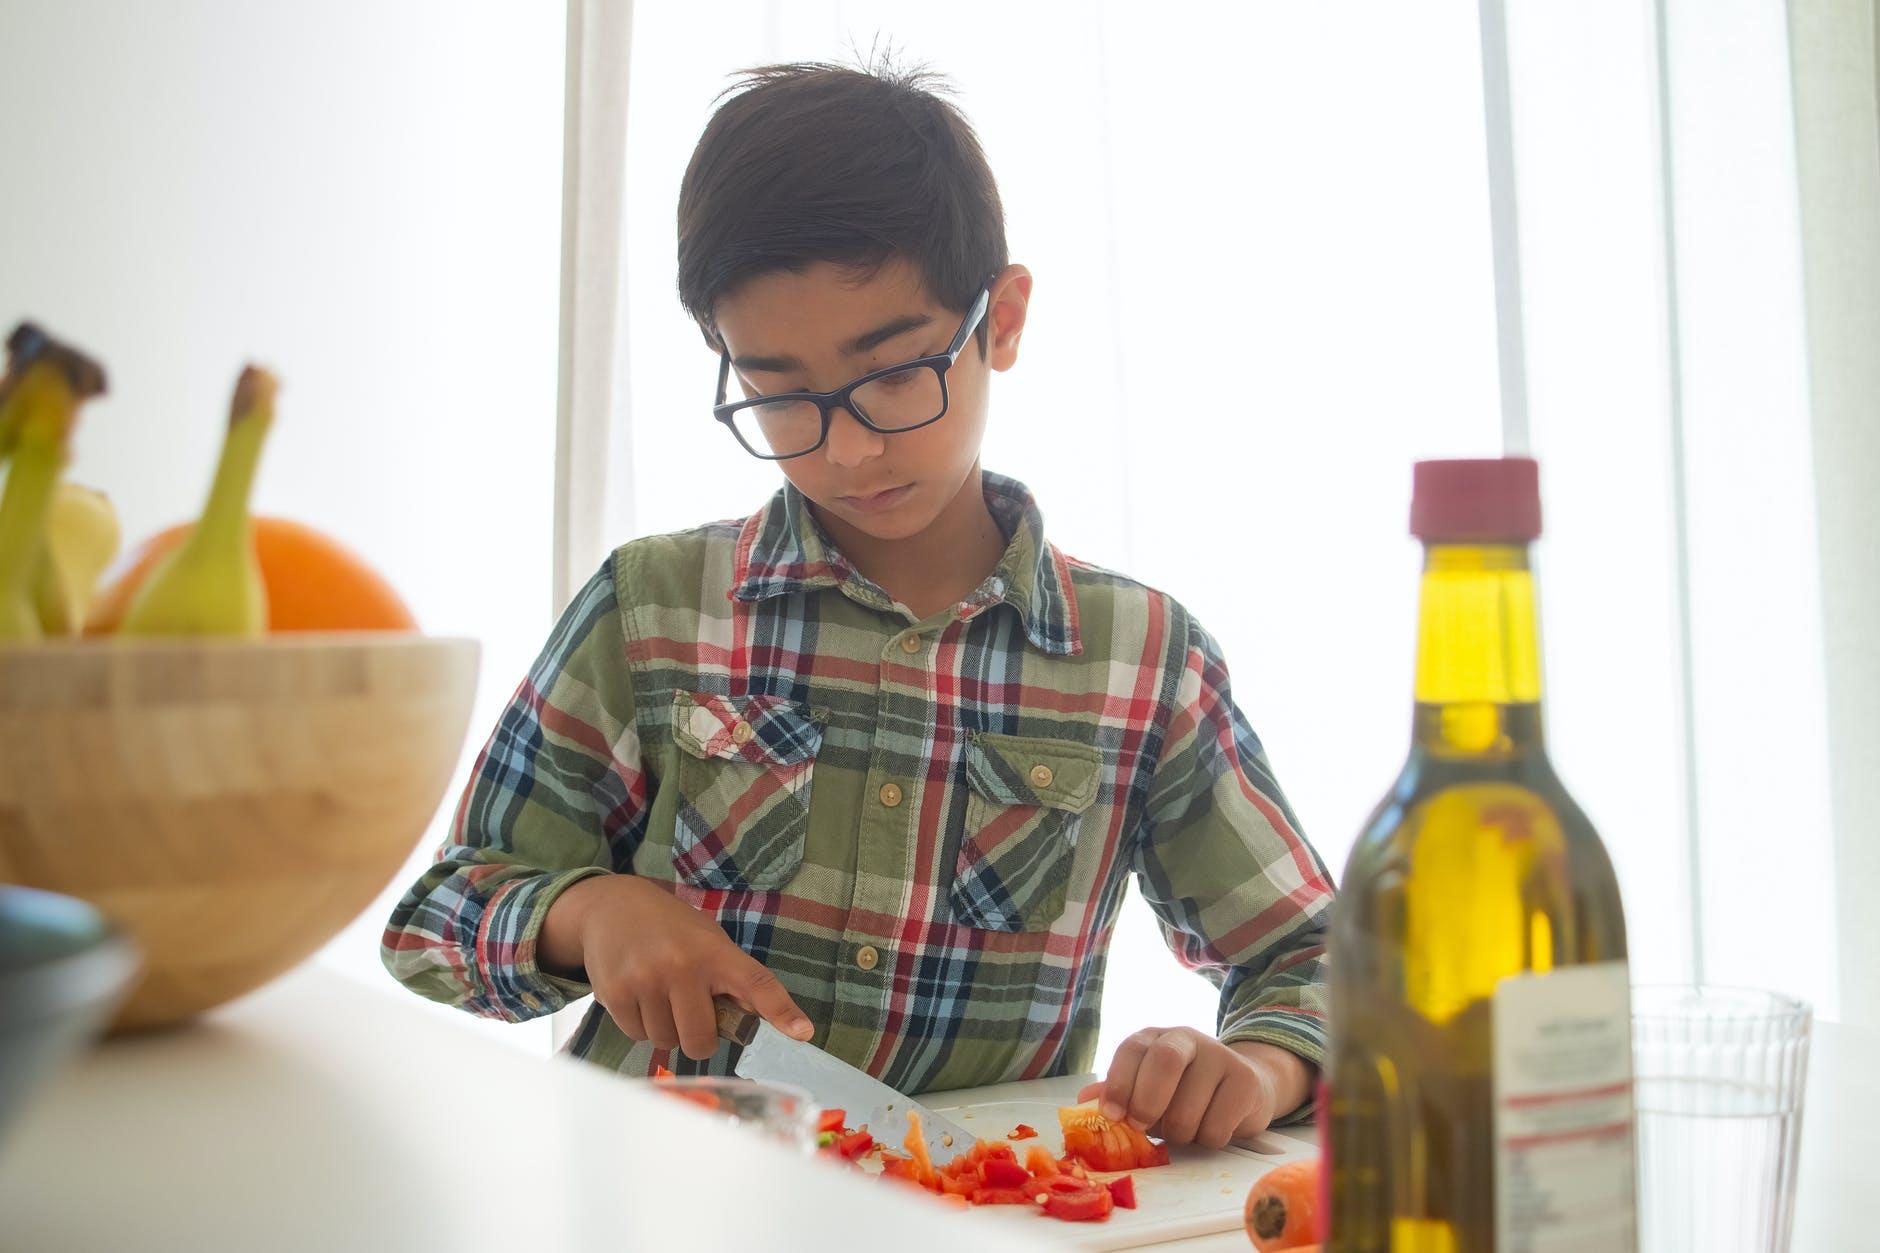 boy slicing tomatoes